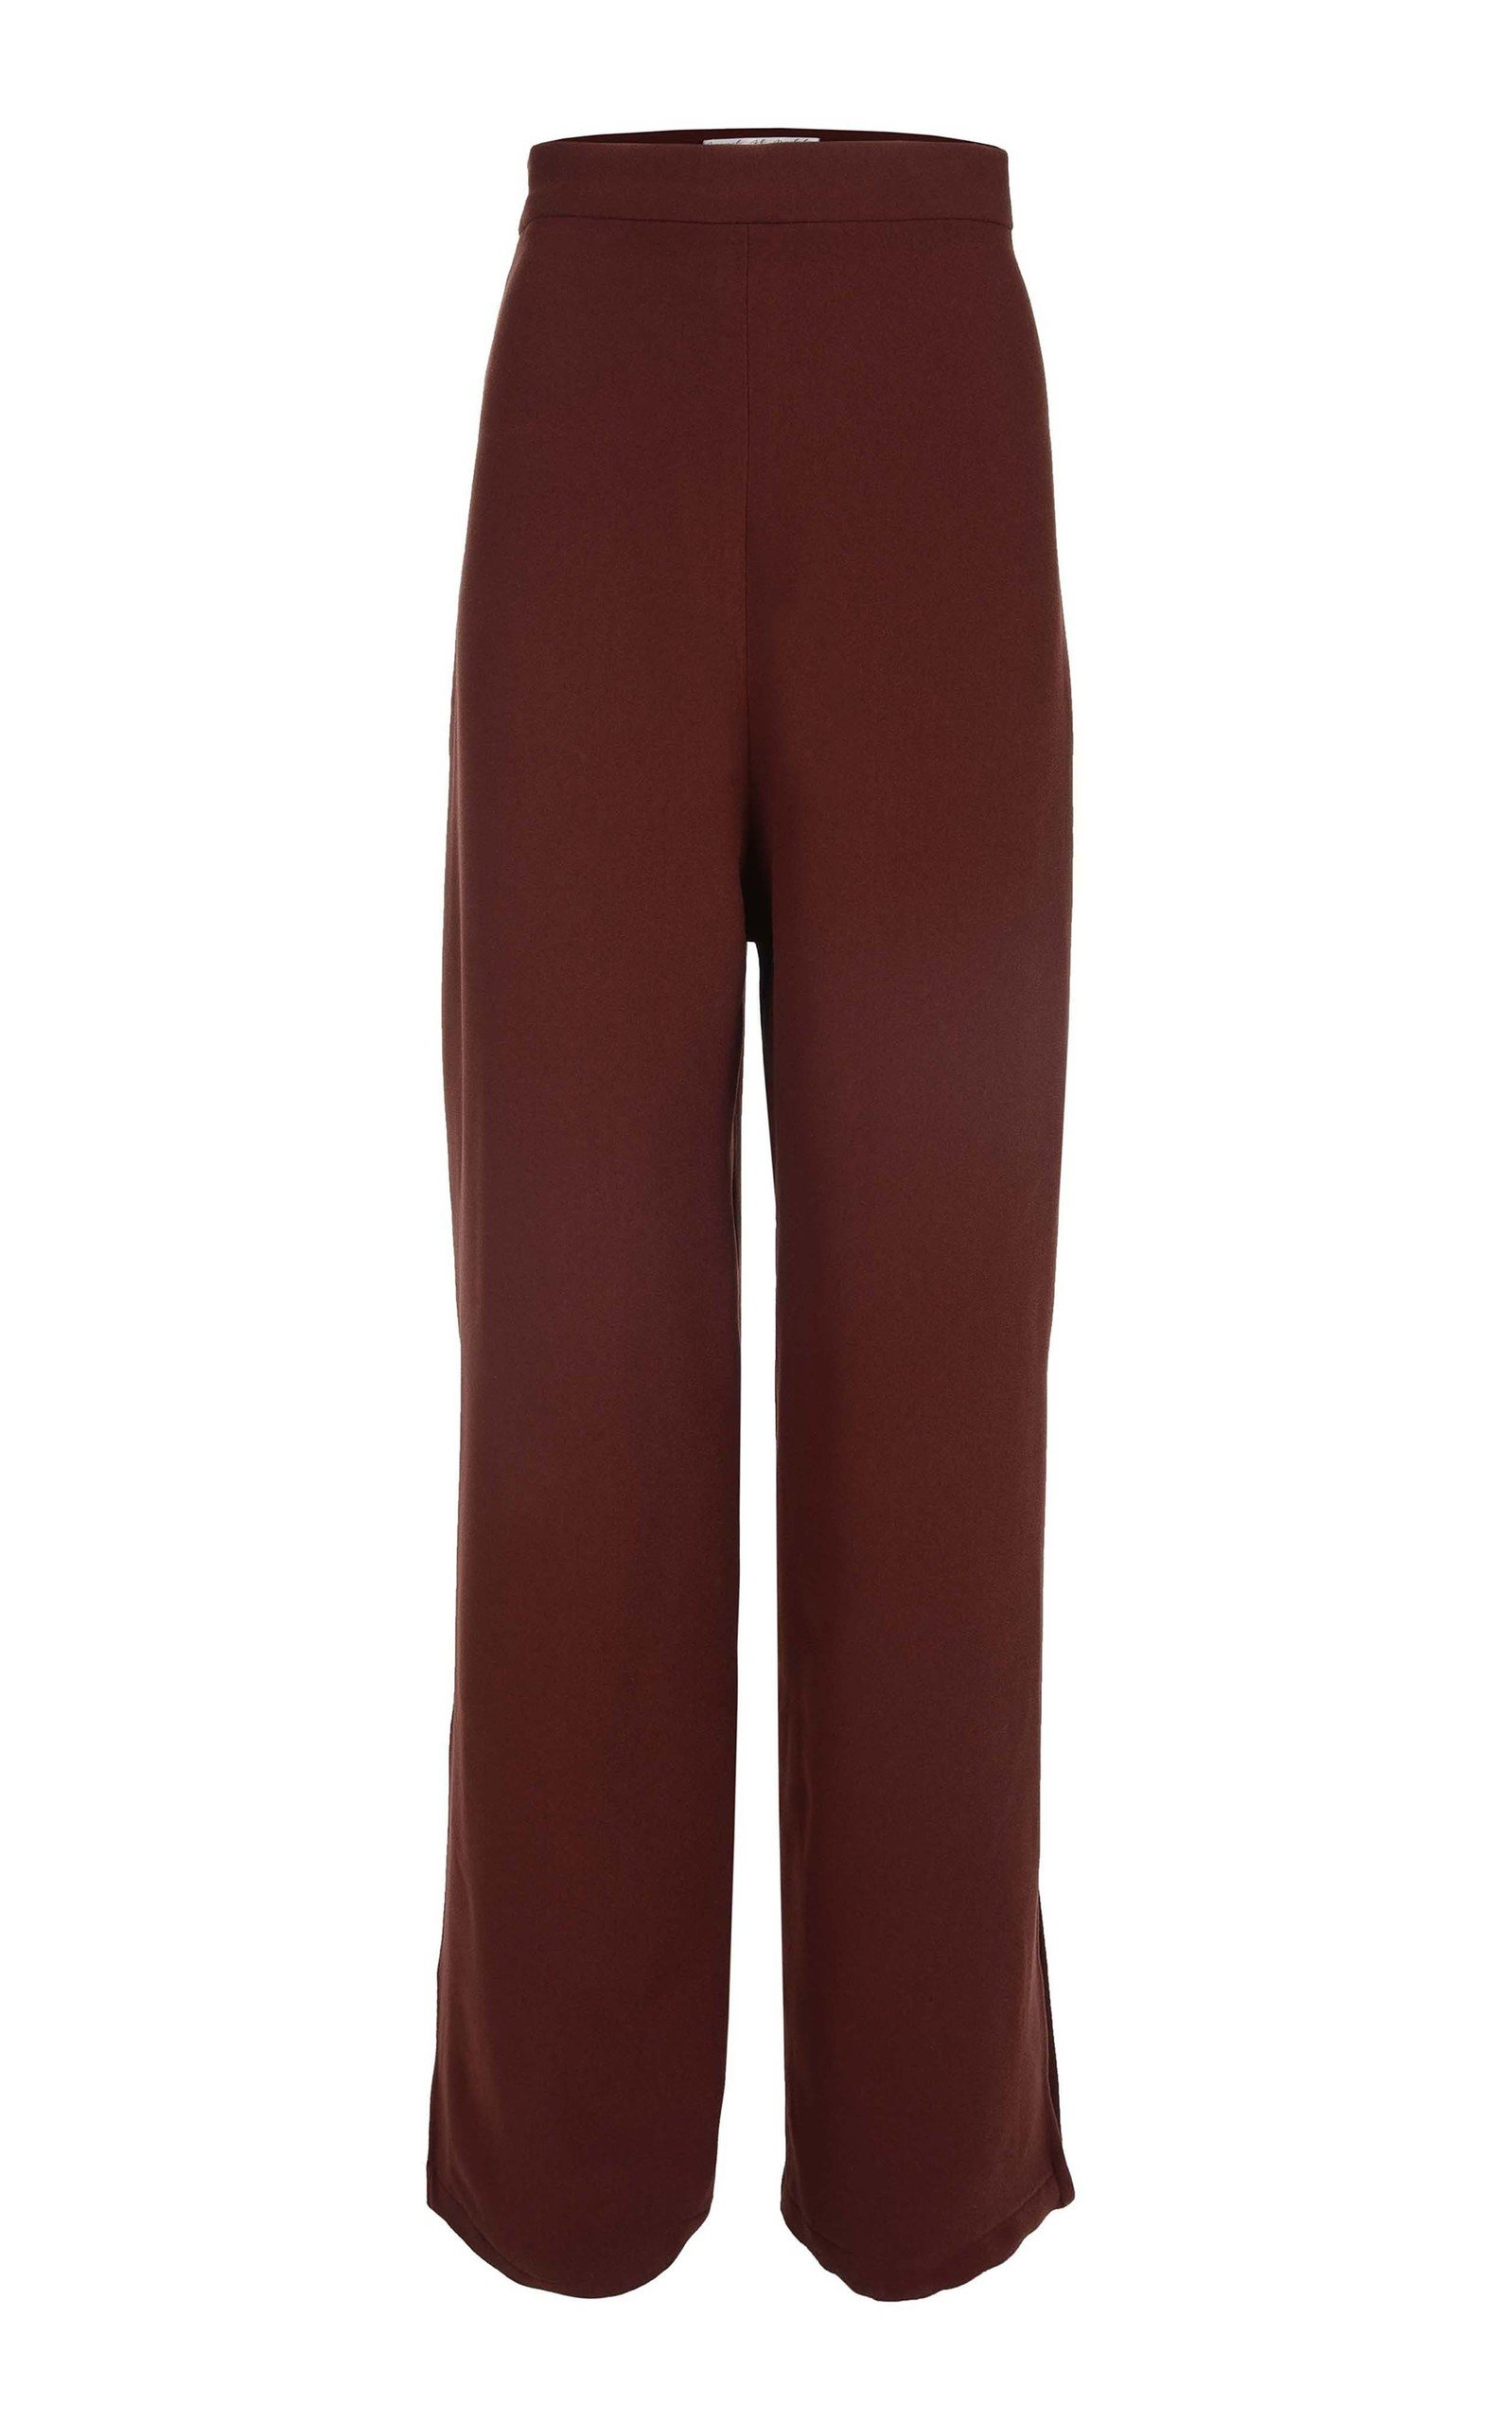 AMAL AL MULLA Wide Leg Crepe Pants in Burgundy